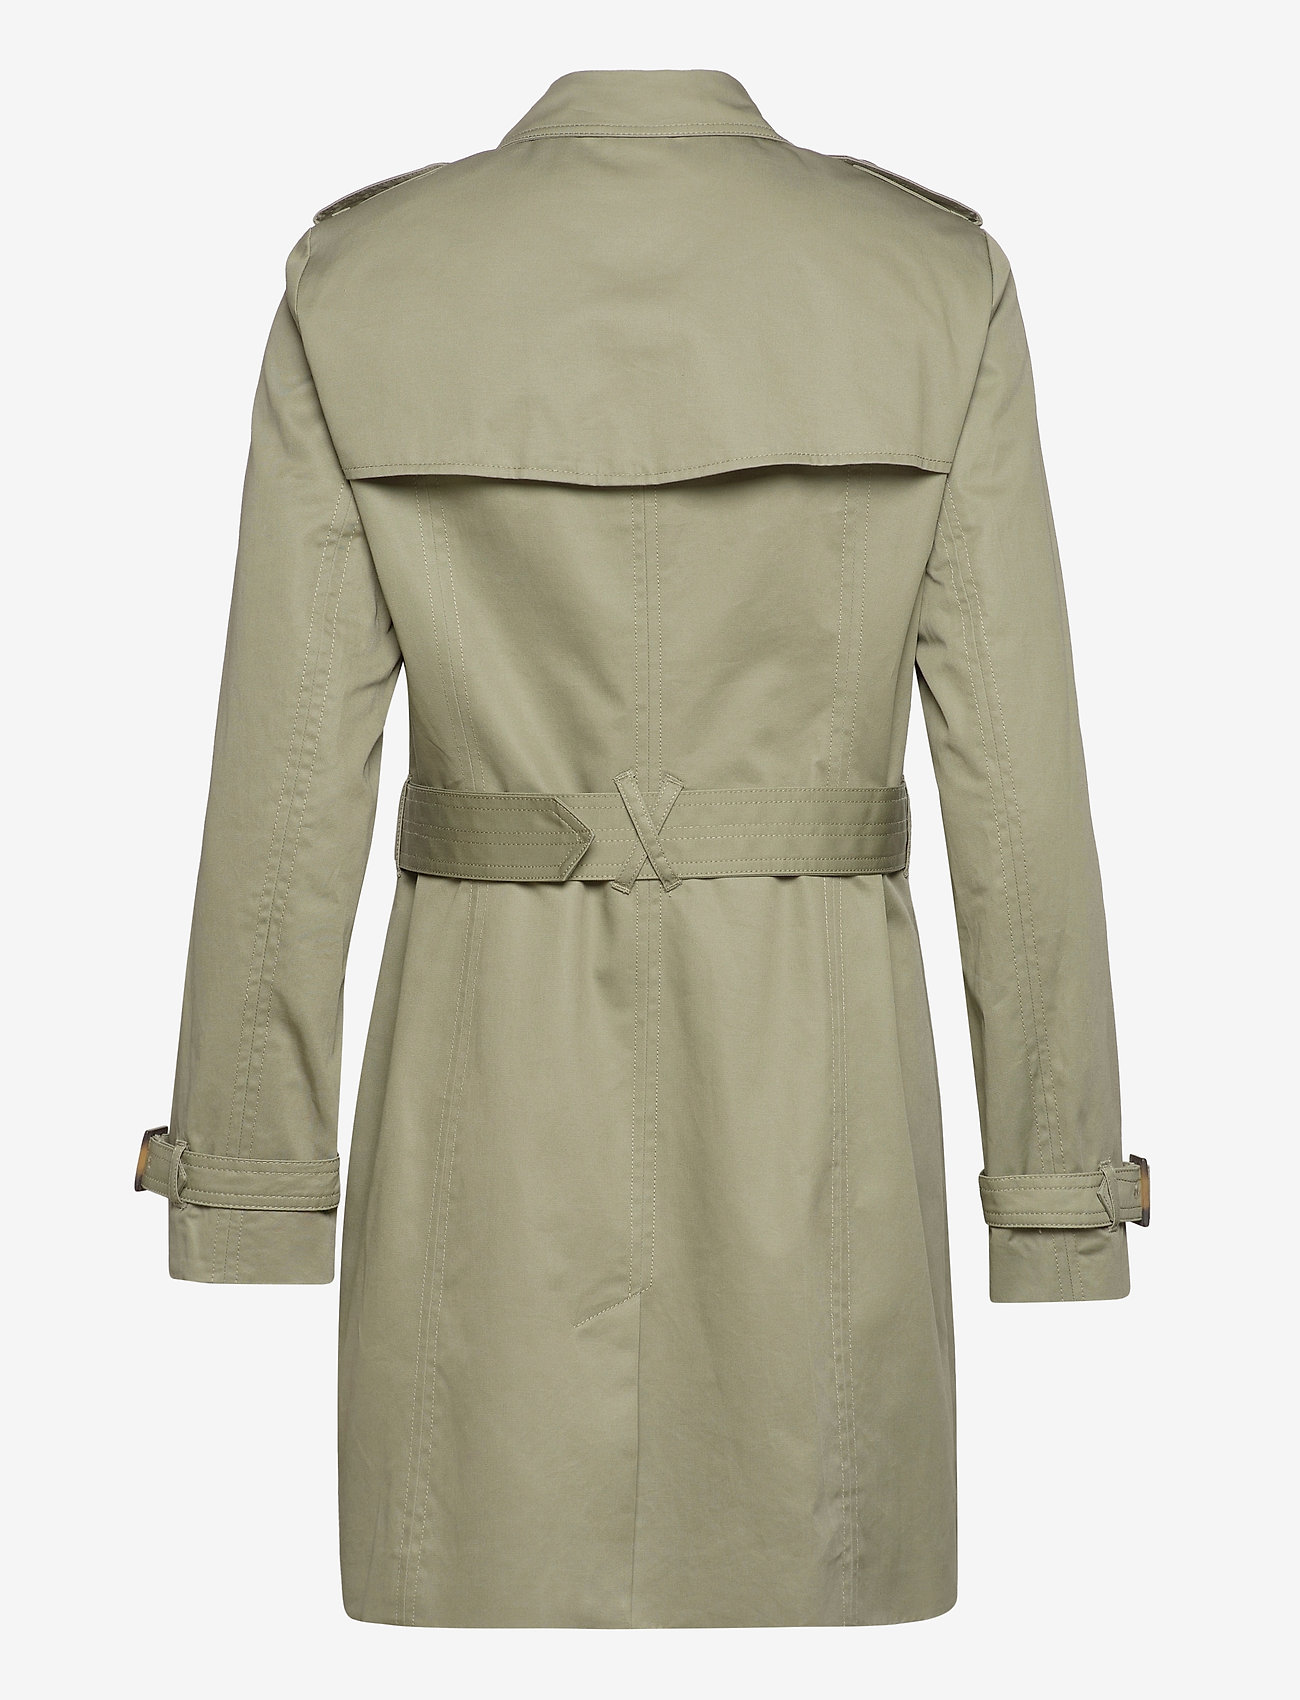 Esprit Casual - Coats woven - trenchs - light khaki - 1